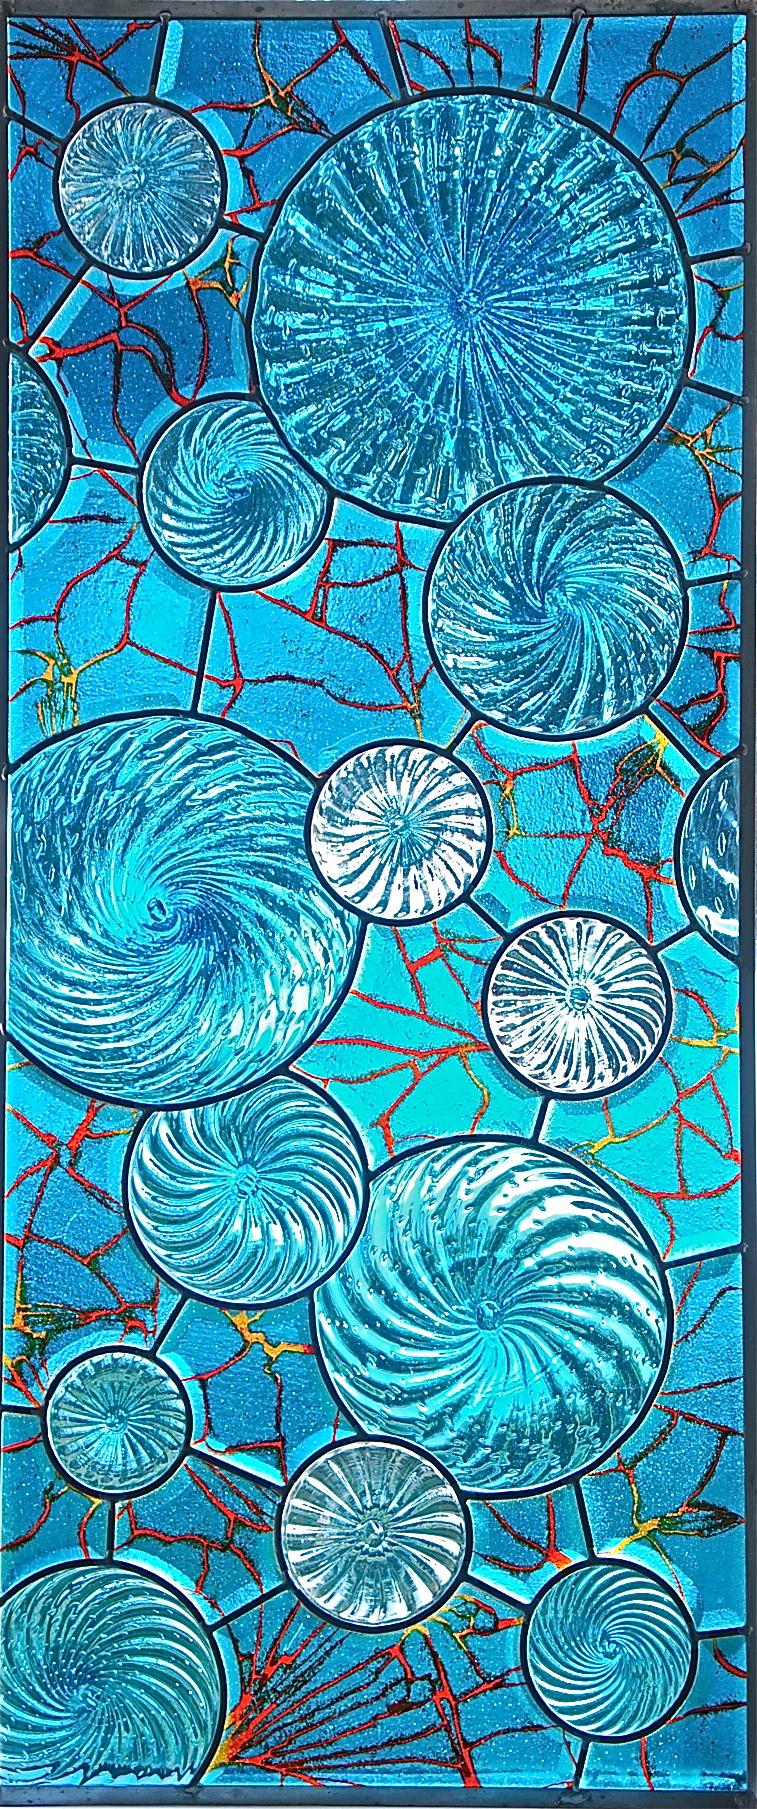 Collaboration with J. Cox, Haiku Glass